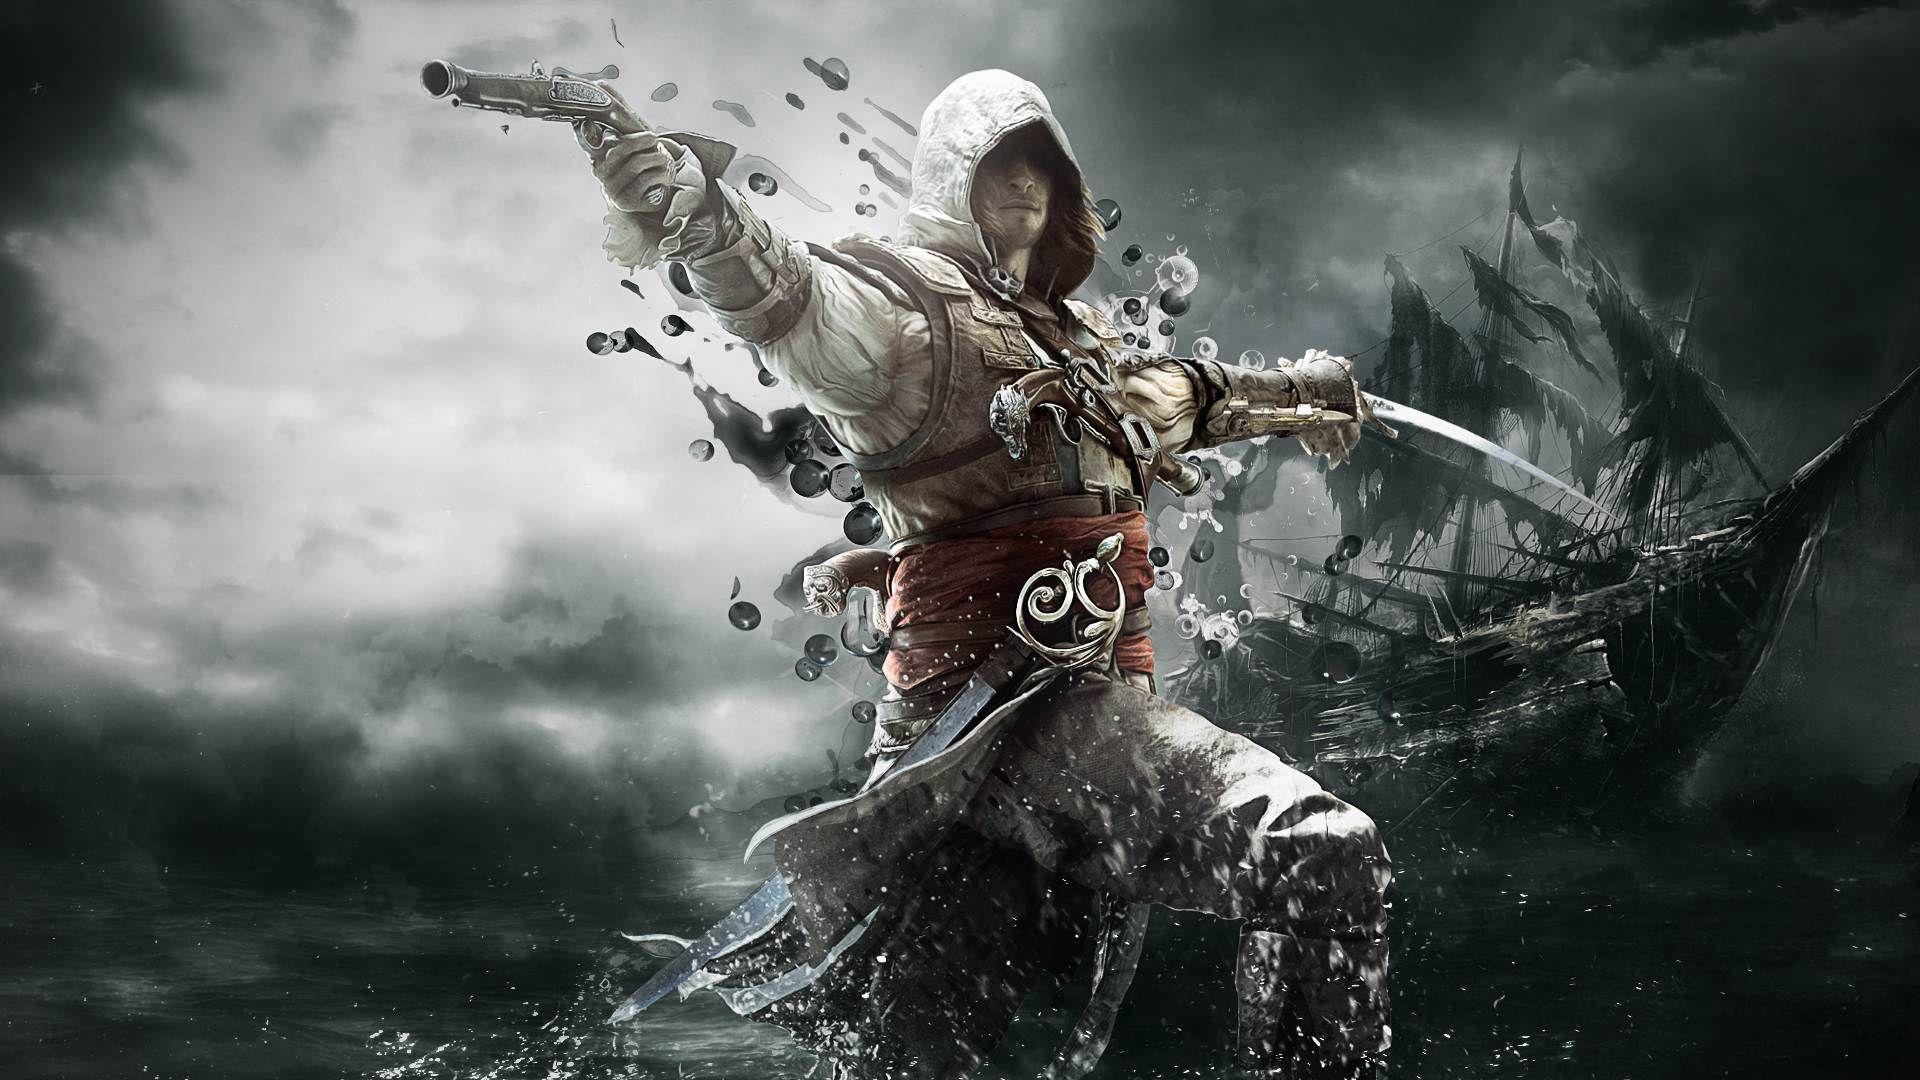 Assassins Creed 4 Black Flag Jackdaw Cosmetic Upgrades